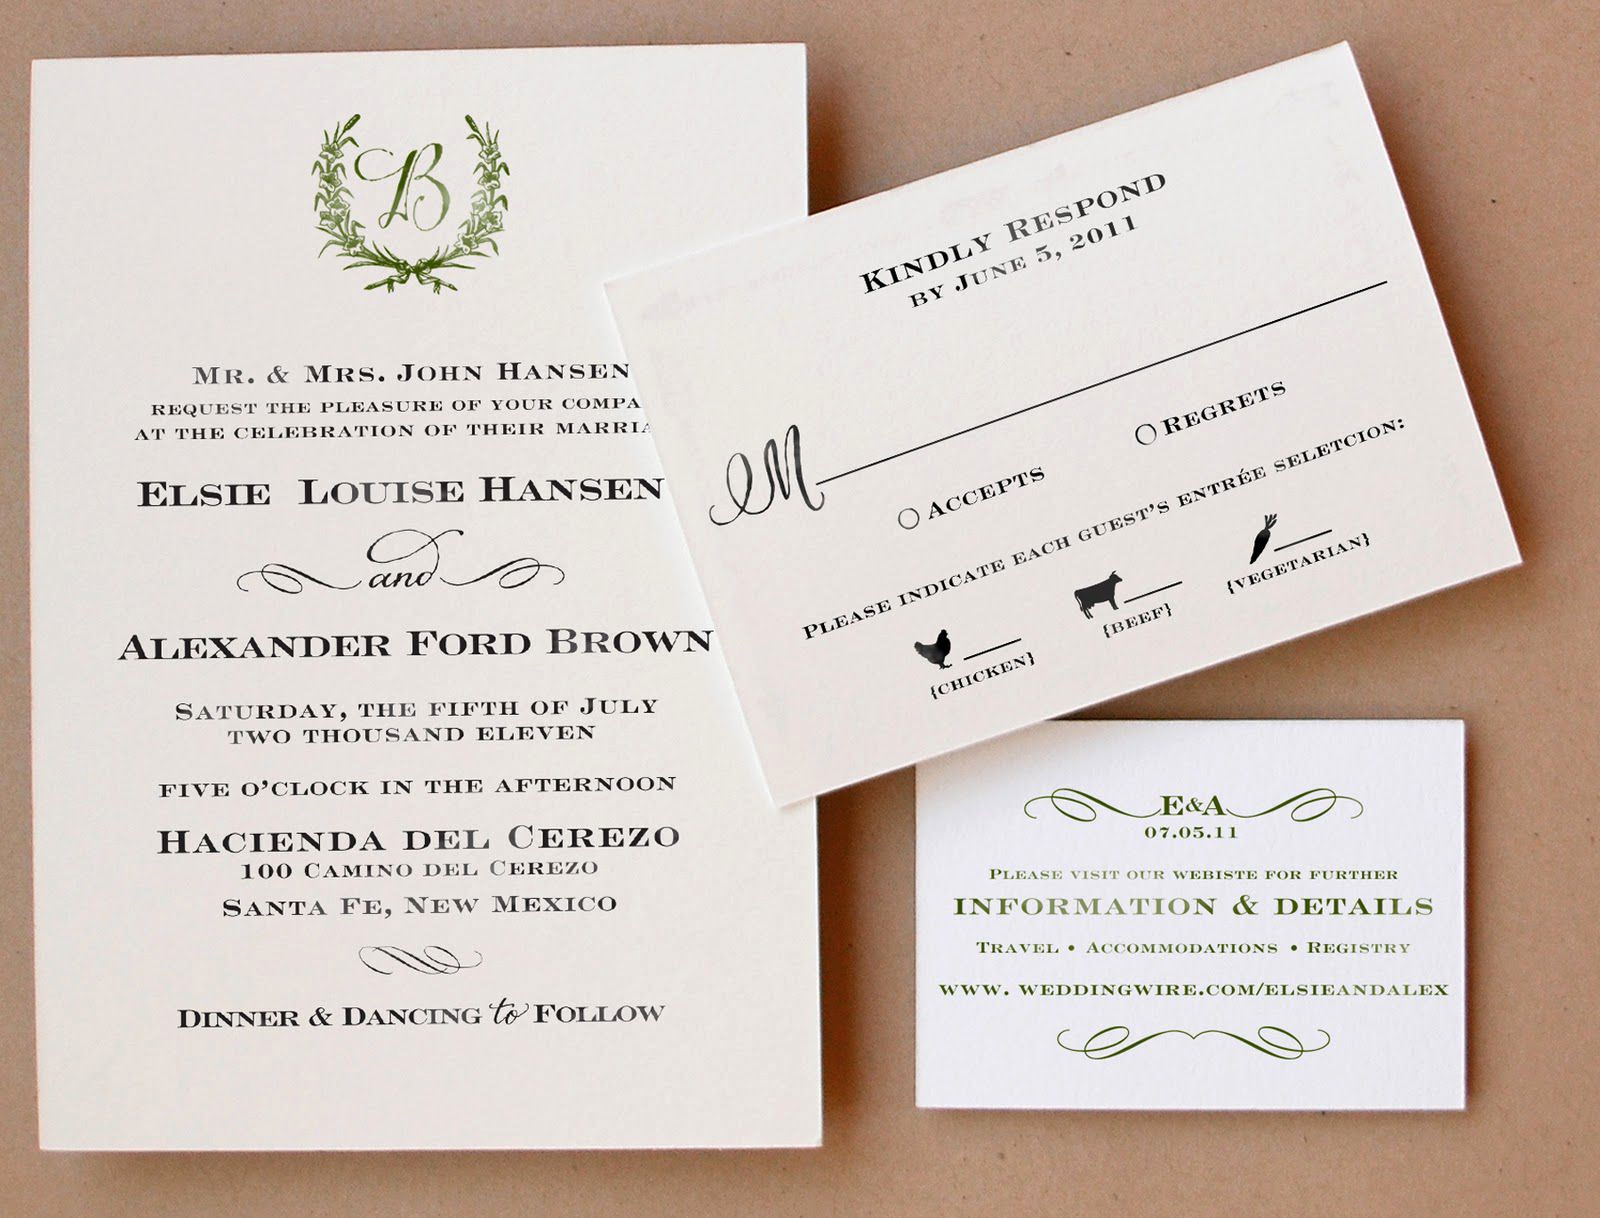 Wedding Invitation Details Card Wording Fresh event Invitation Wedding Invitations Reply Cards Card